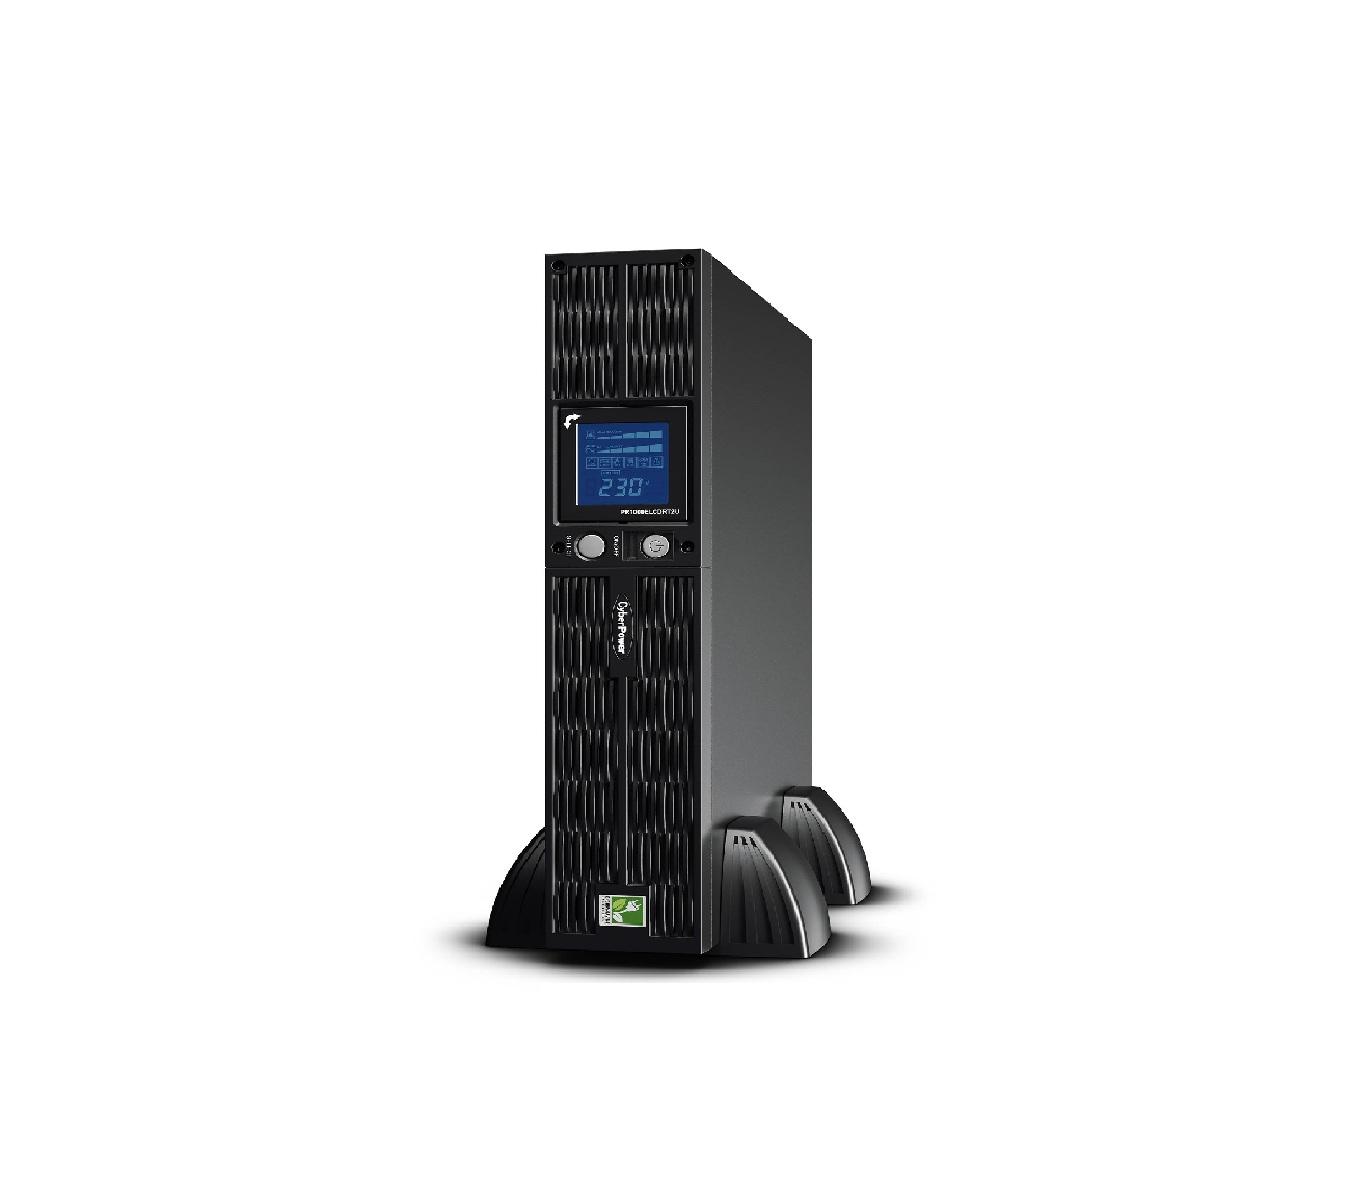 Bộ lưu điện UPS CyberPower PR2200ELCDRT2U 2200VA